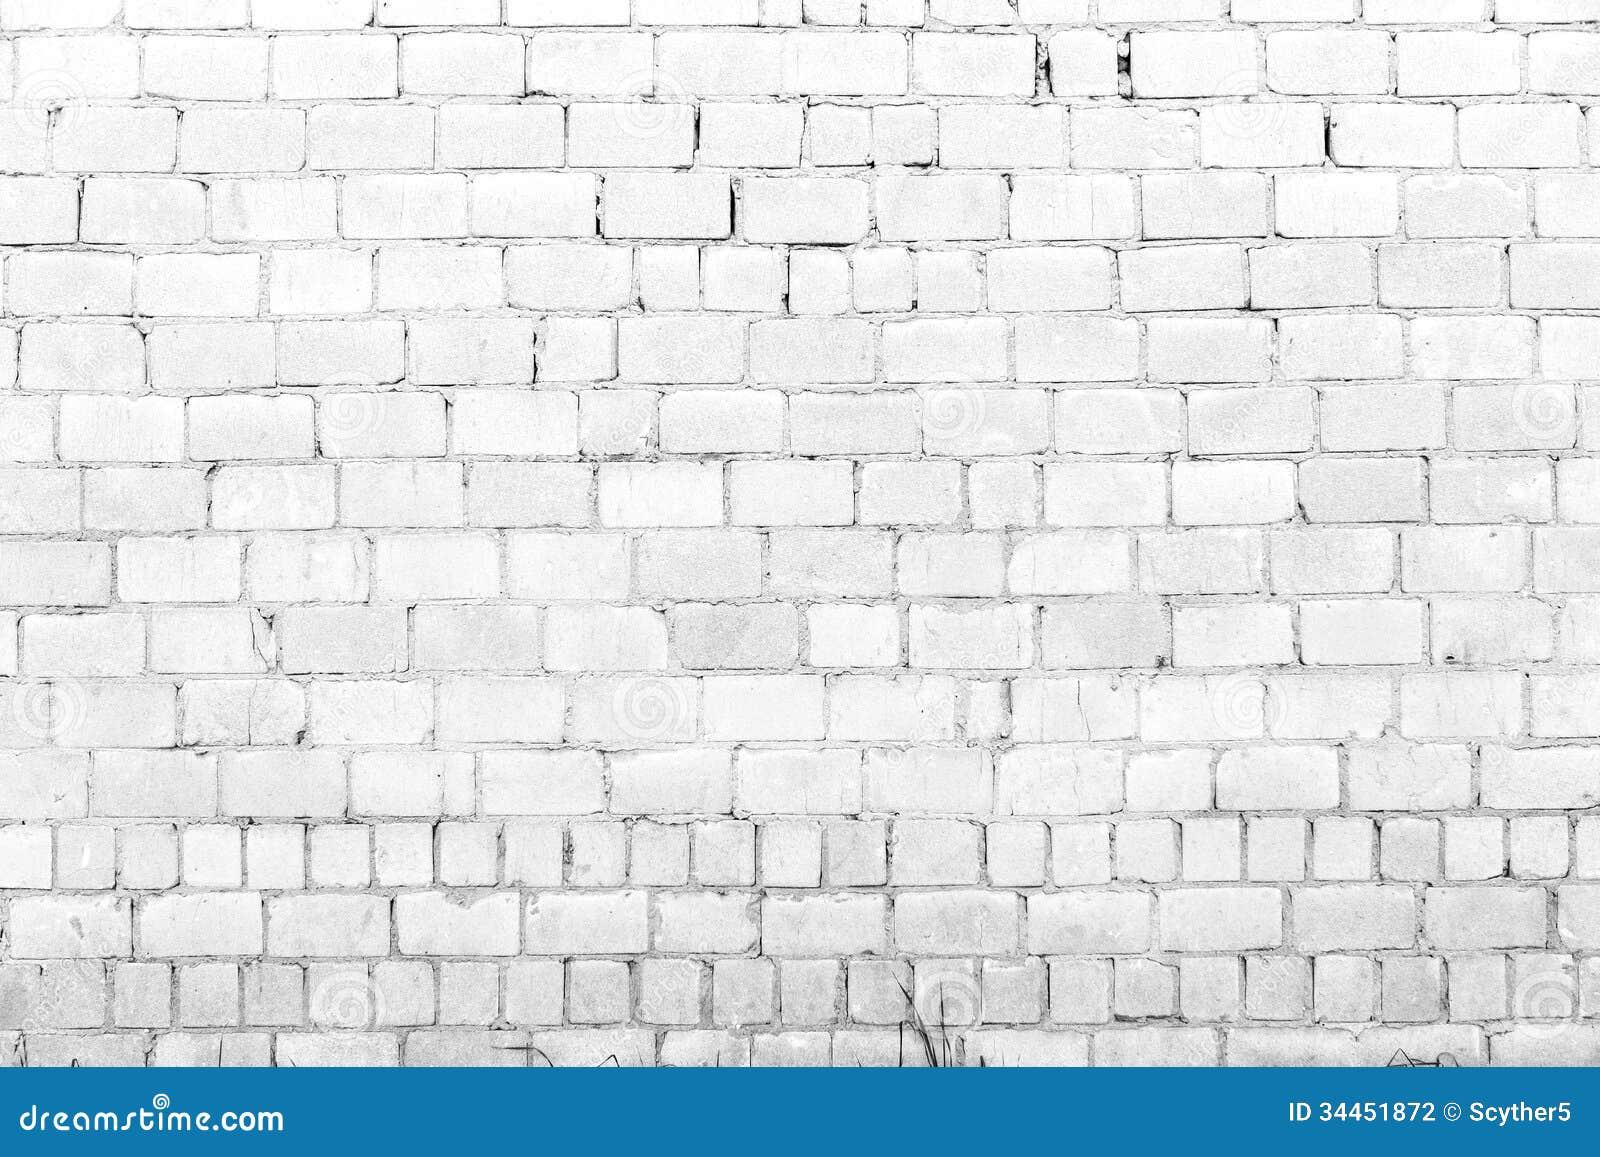 Fondo blanco de la pared de ladrillo fotograf a de archivo - Pared ladrillo blanco ...